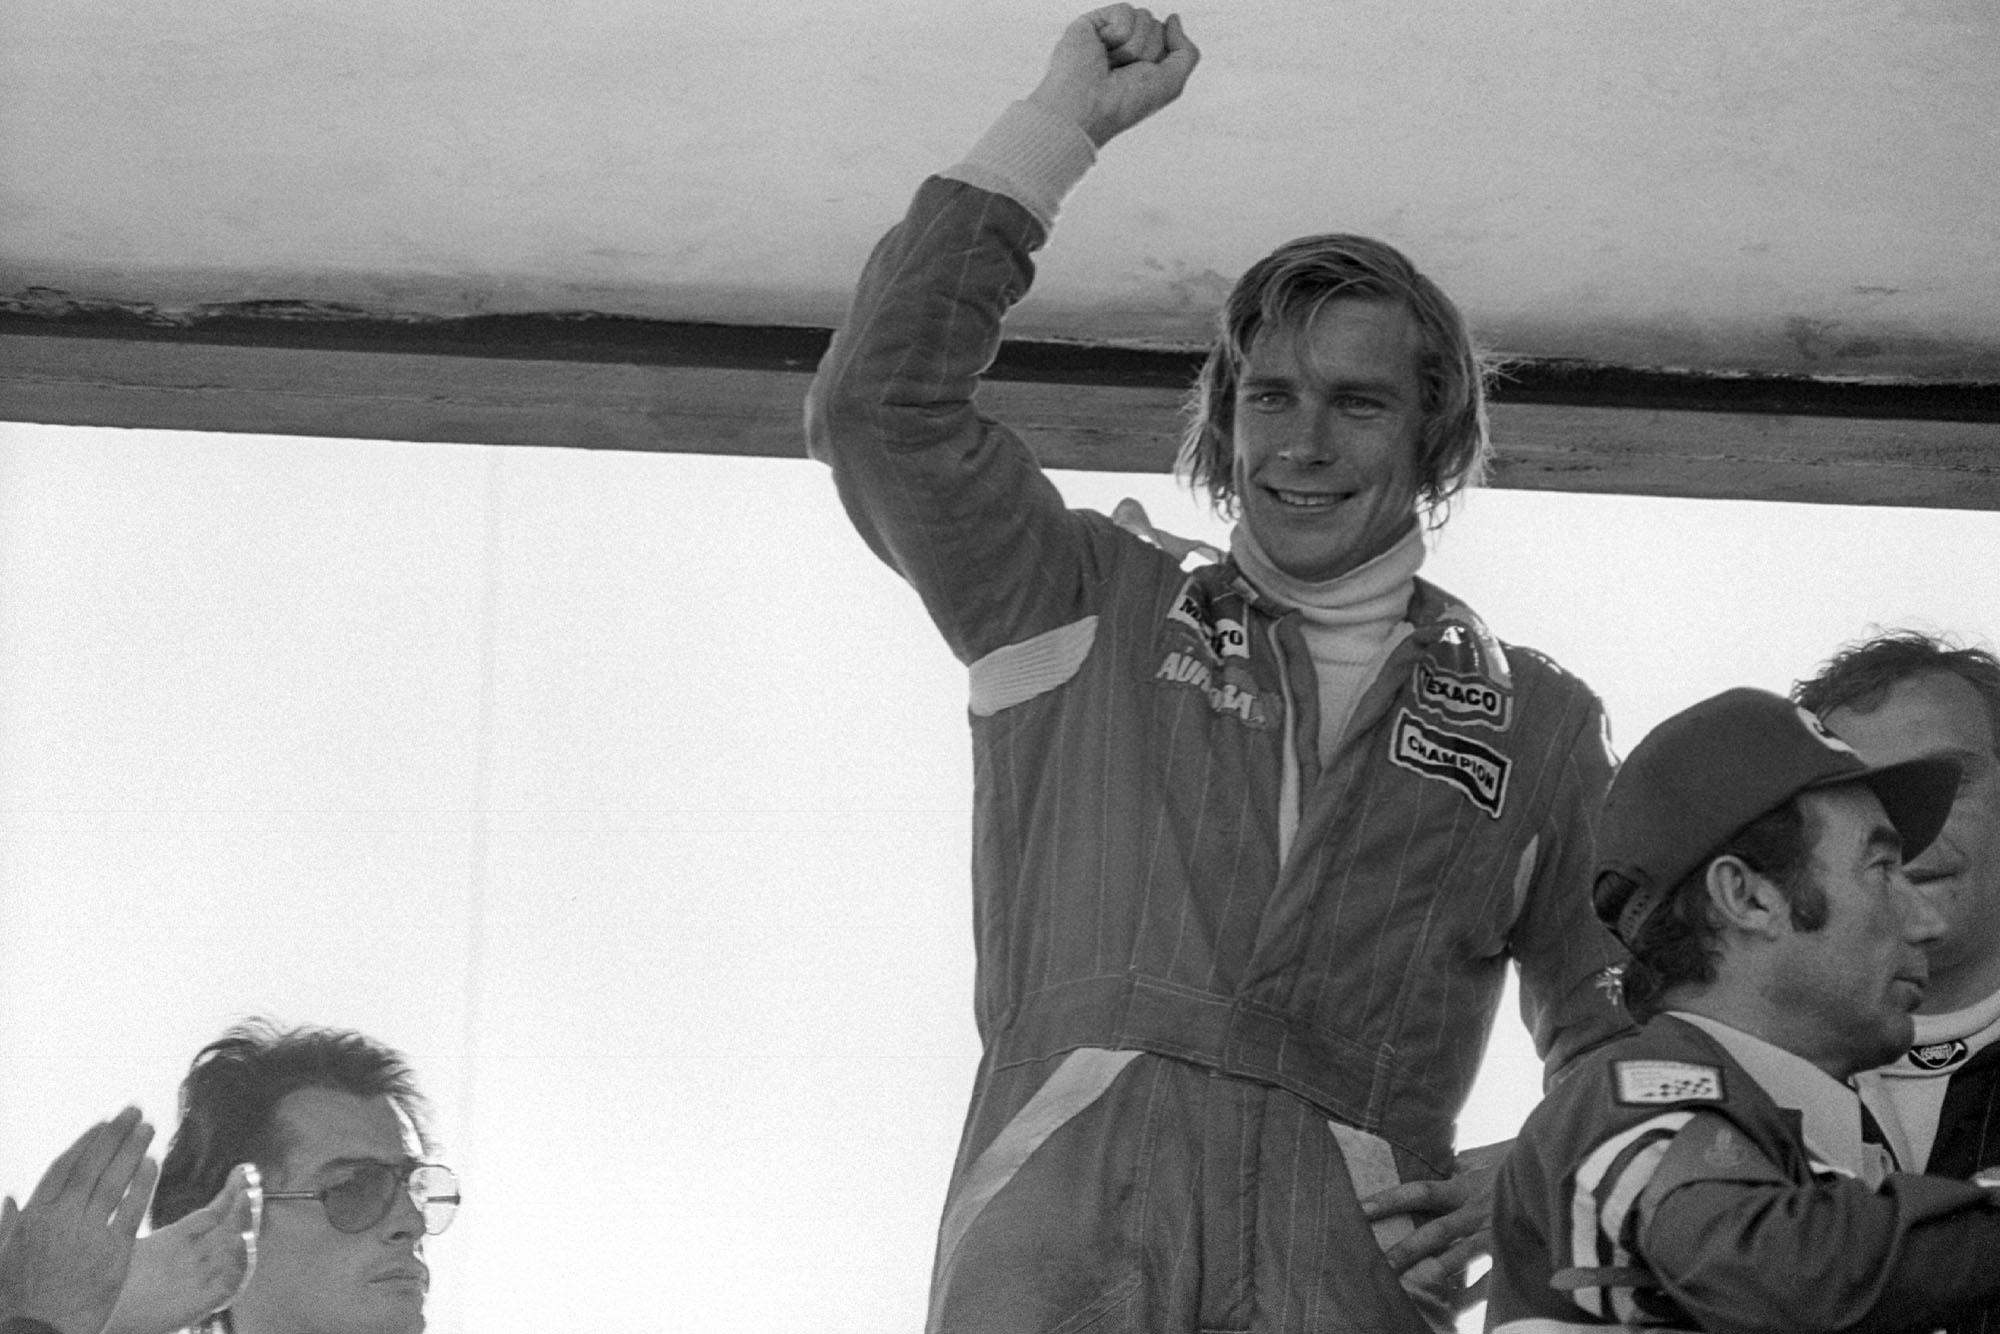 James Hunt (McLaren) after winning the 1976 Spanish Grand Prix.